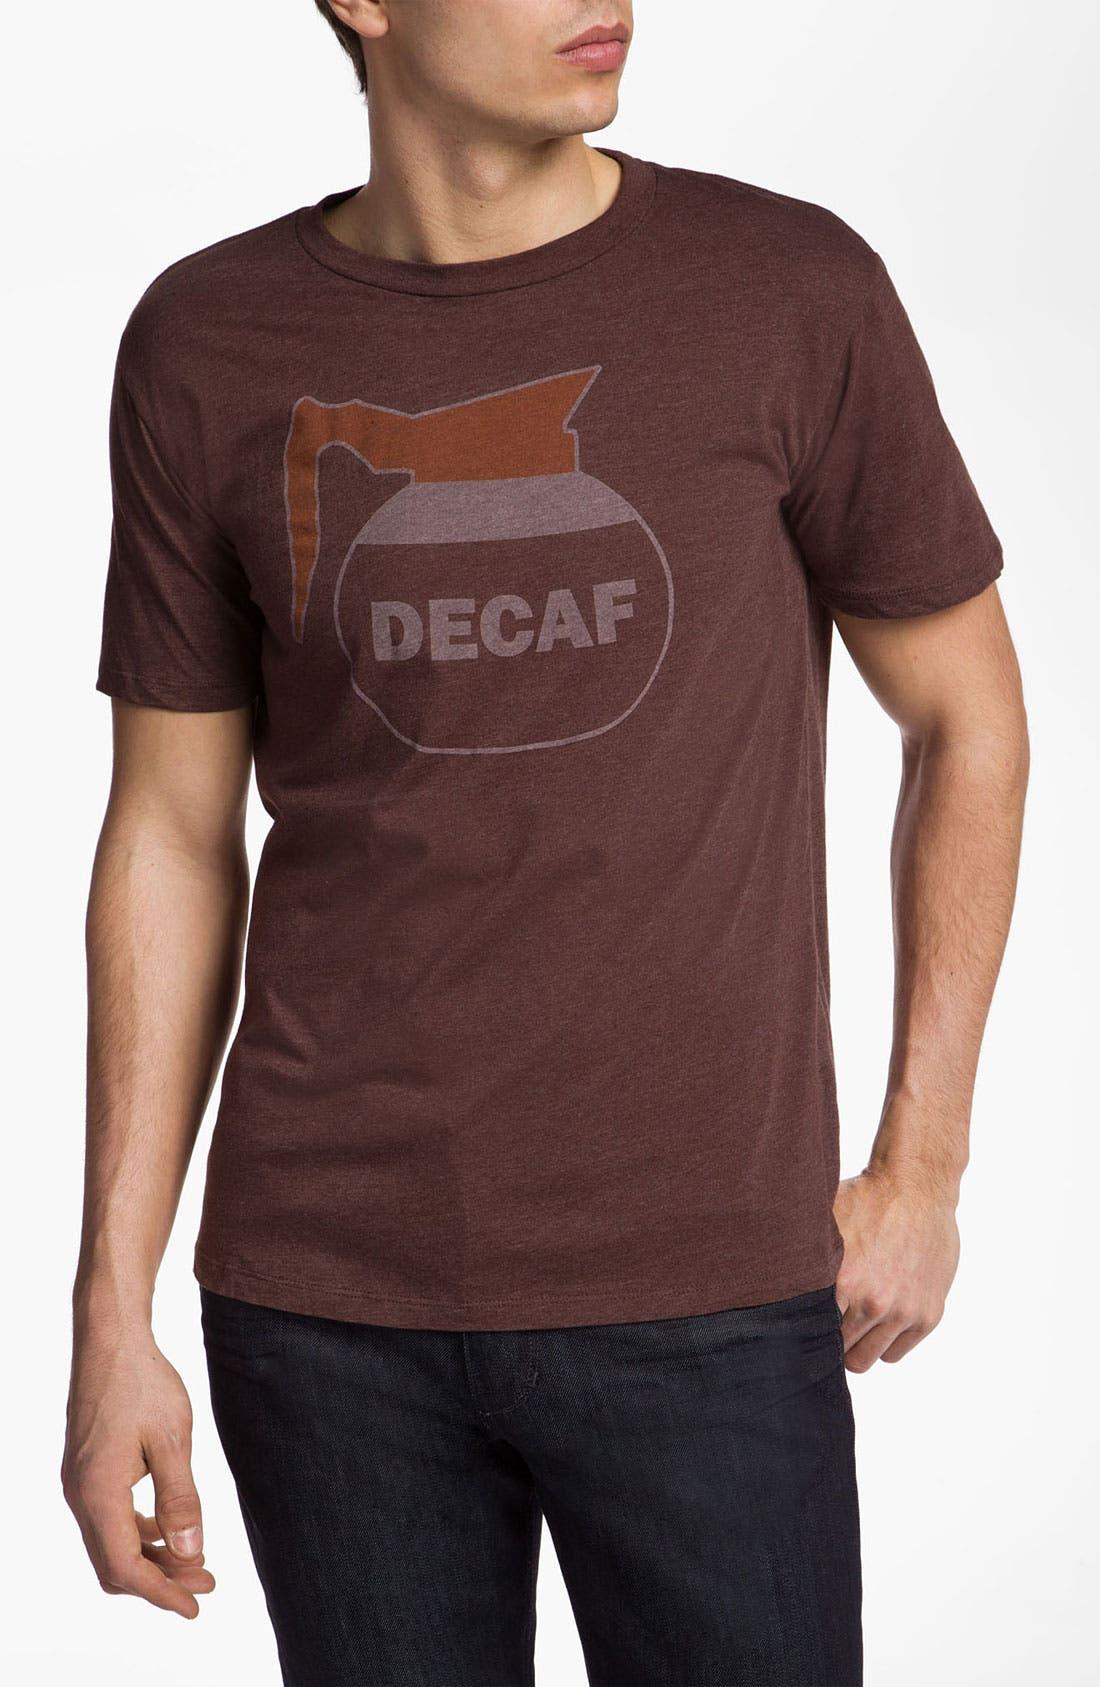 Main Image - Headline Shirts 'Decaf' Graphic T-Shirt